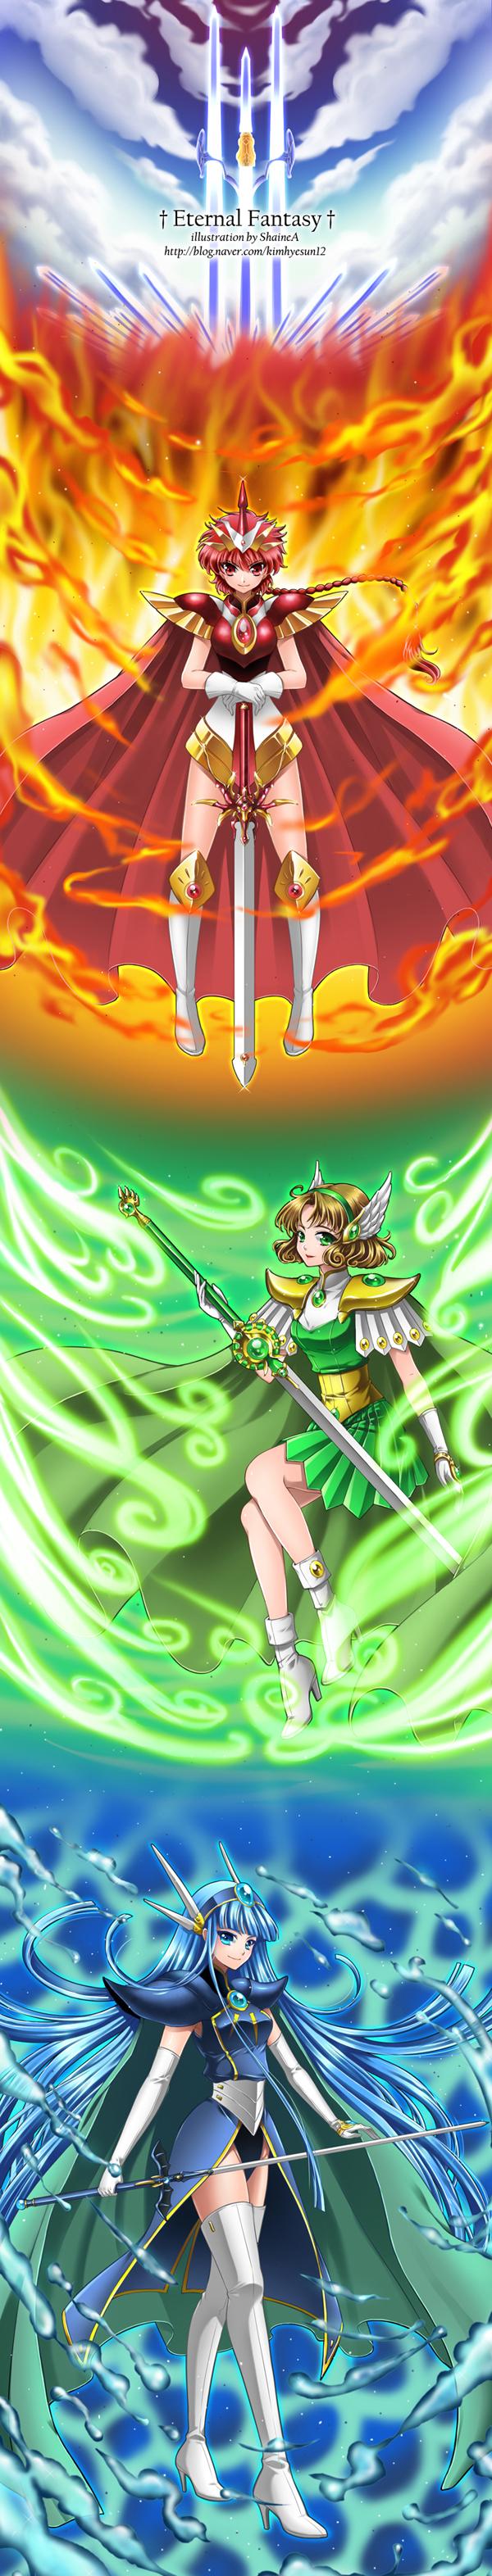 Tags: Anime, ShaineA, Magic Knight Rayearth, Shidou Hikaru, Hououji Fuu, Ryuuzaki Umi, Rapier